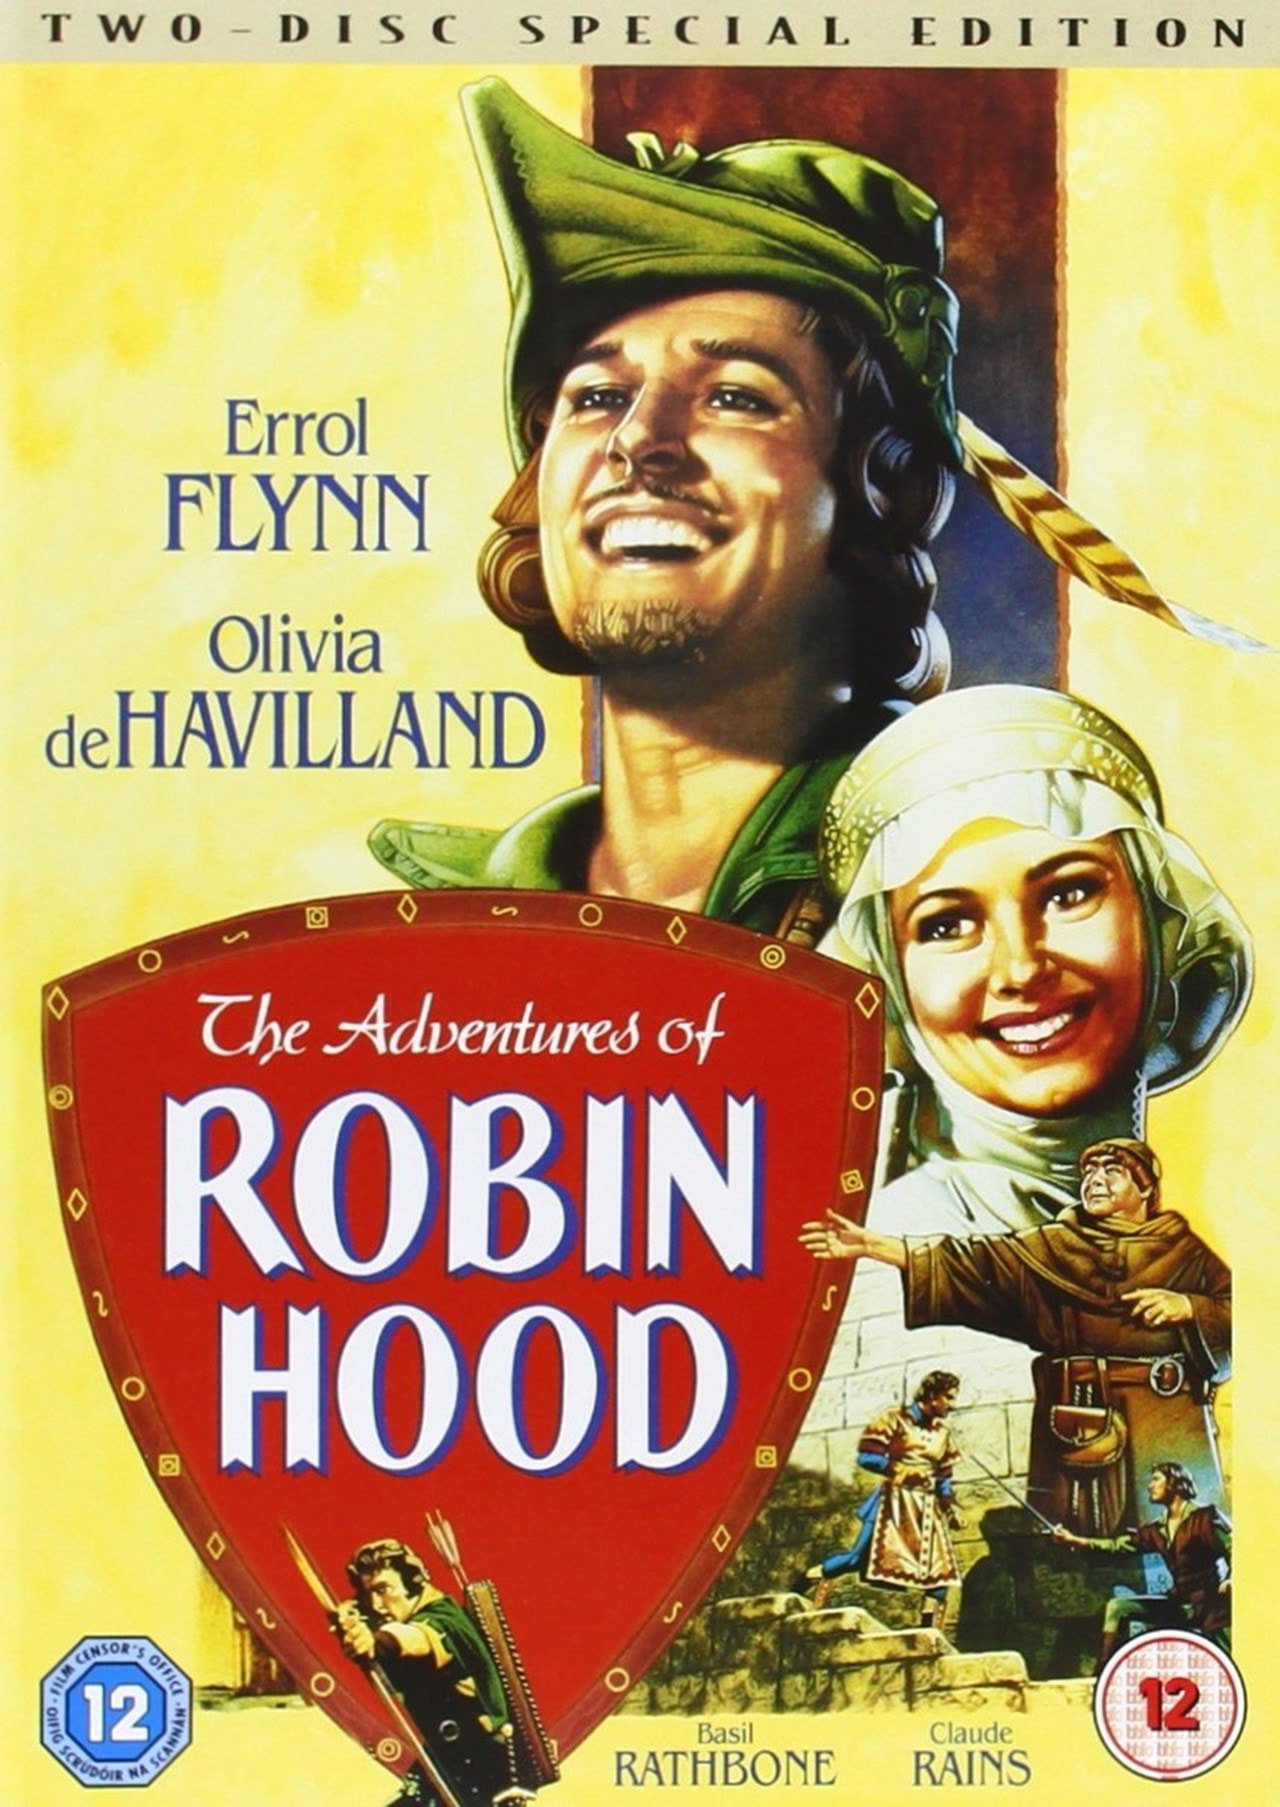 The Adventures of Robin Hood - 1